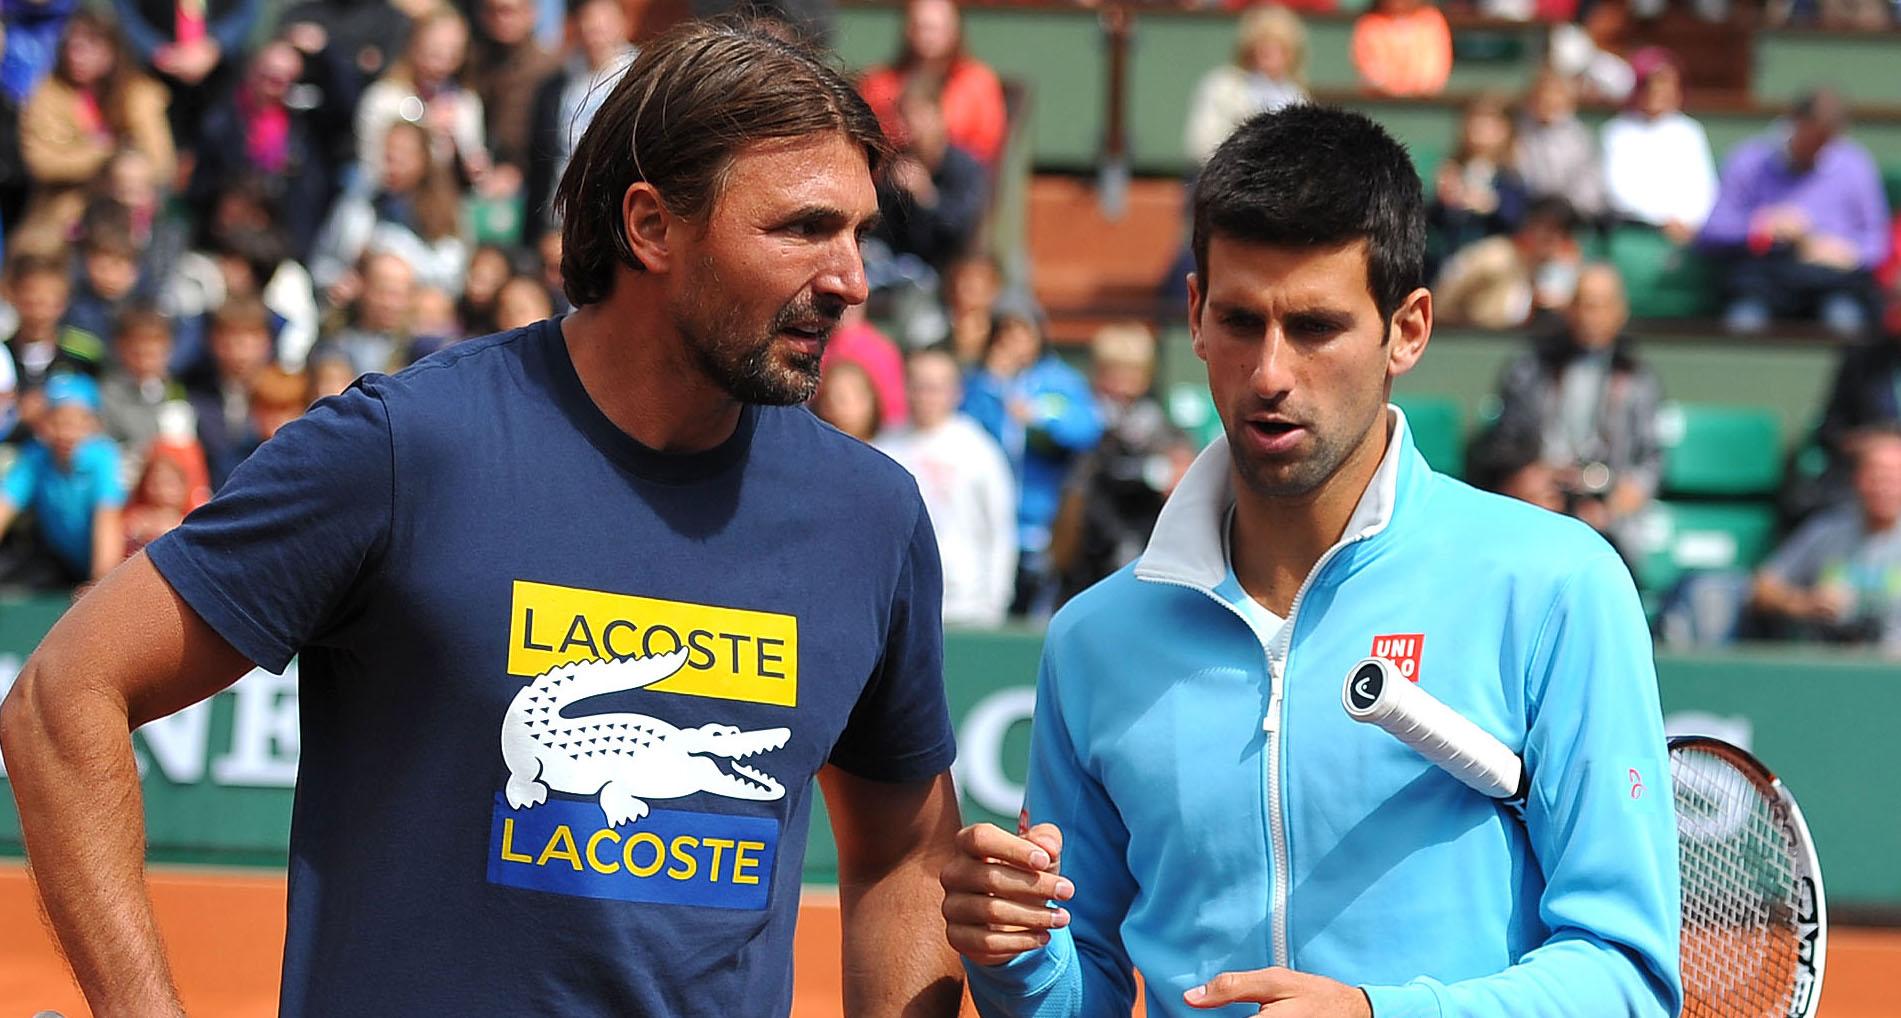 Goran Ivanisevic and Novak Djokovic at Roland-Garros in 2014